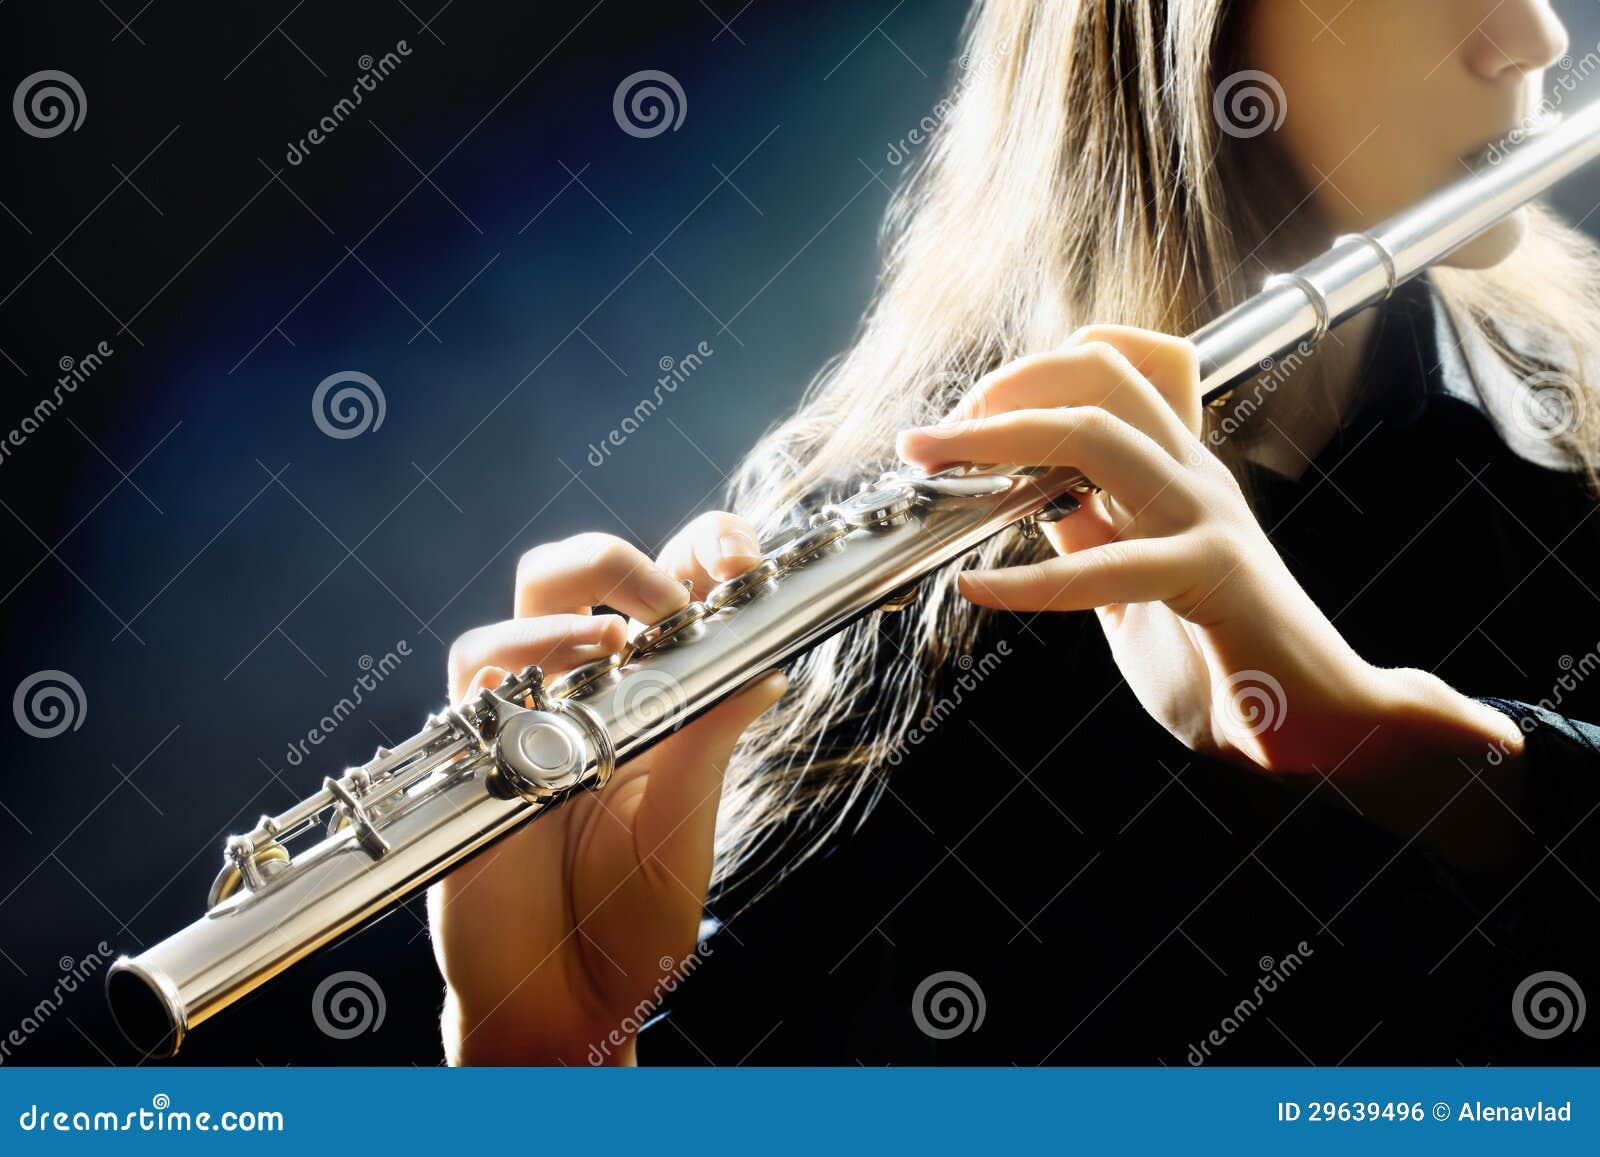 Flute music instrument player